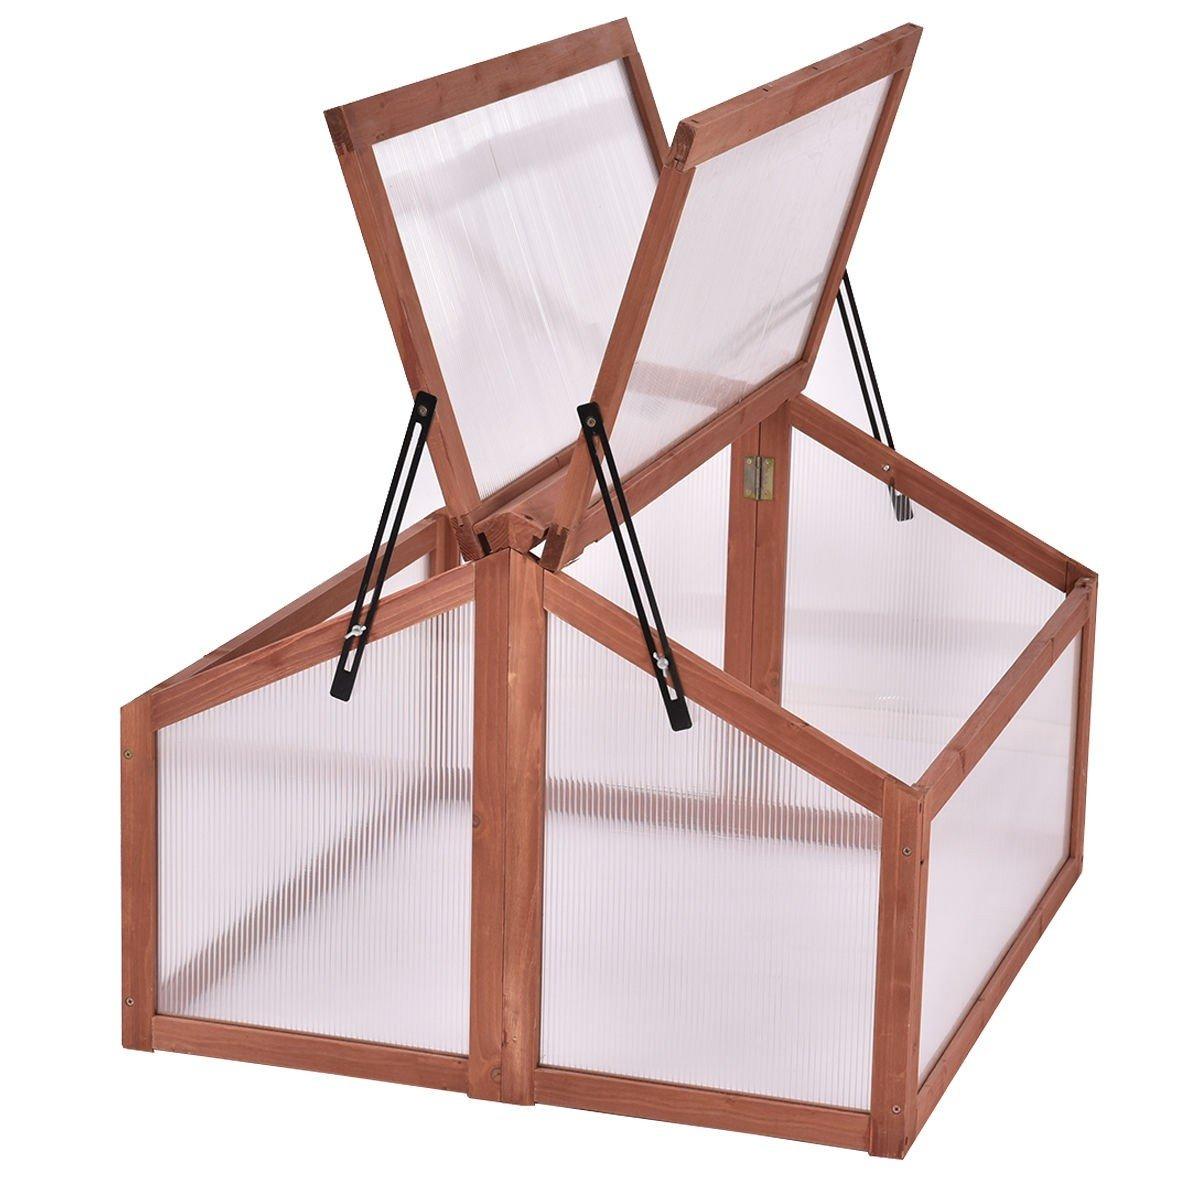 Amazon.com: oldzon doble caja de madera para jardín ...